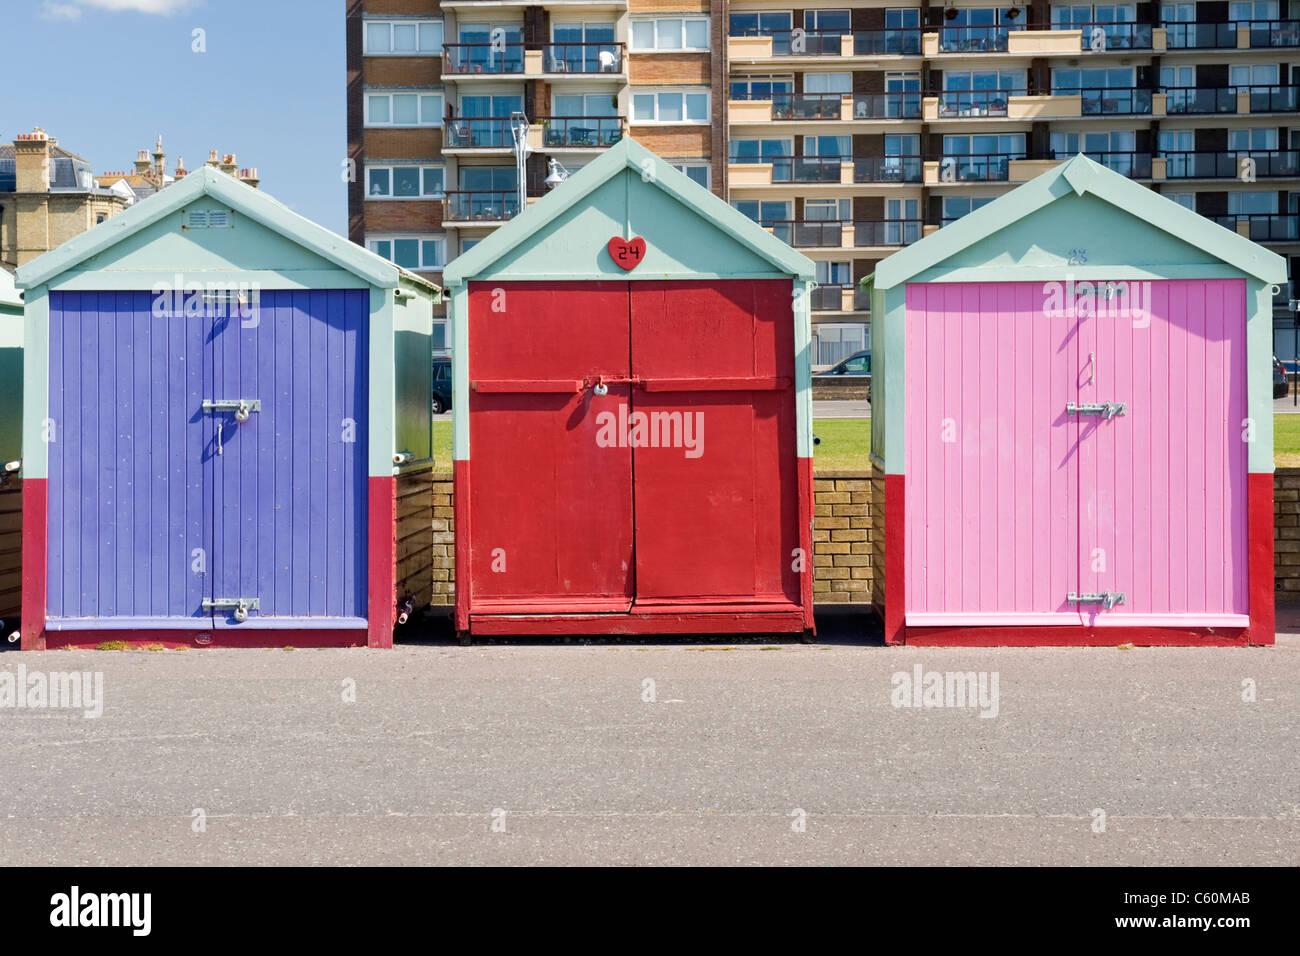 East Sussex, Hütten tatsächlich Hove, bunt oder bunte Strand an der Promenade oder direkt am Meer Stockbild